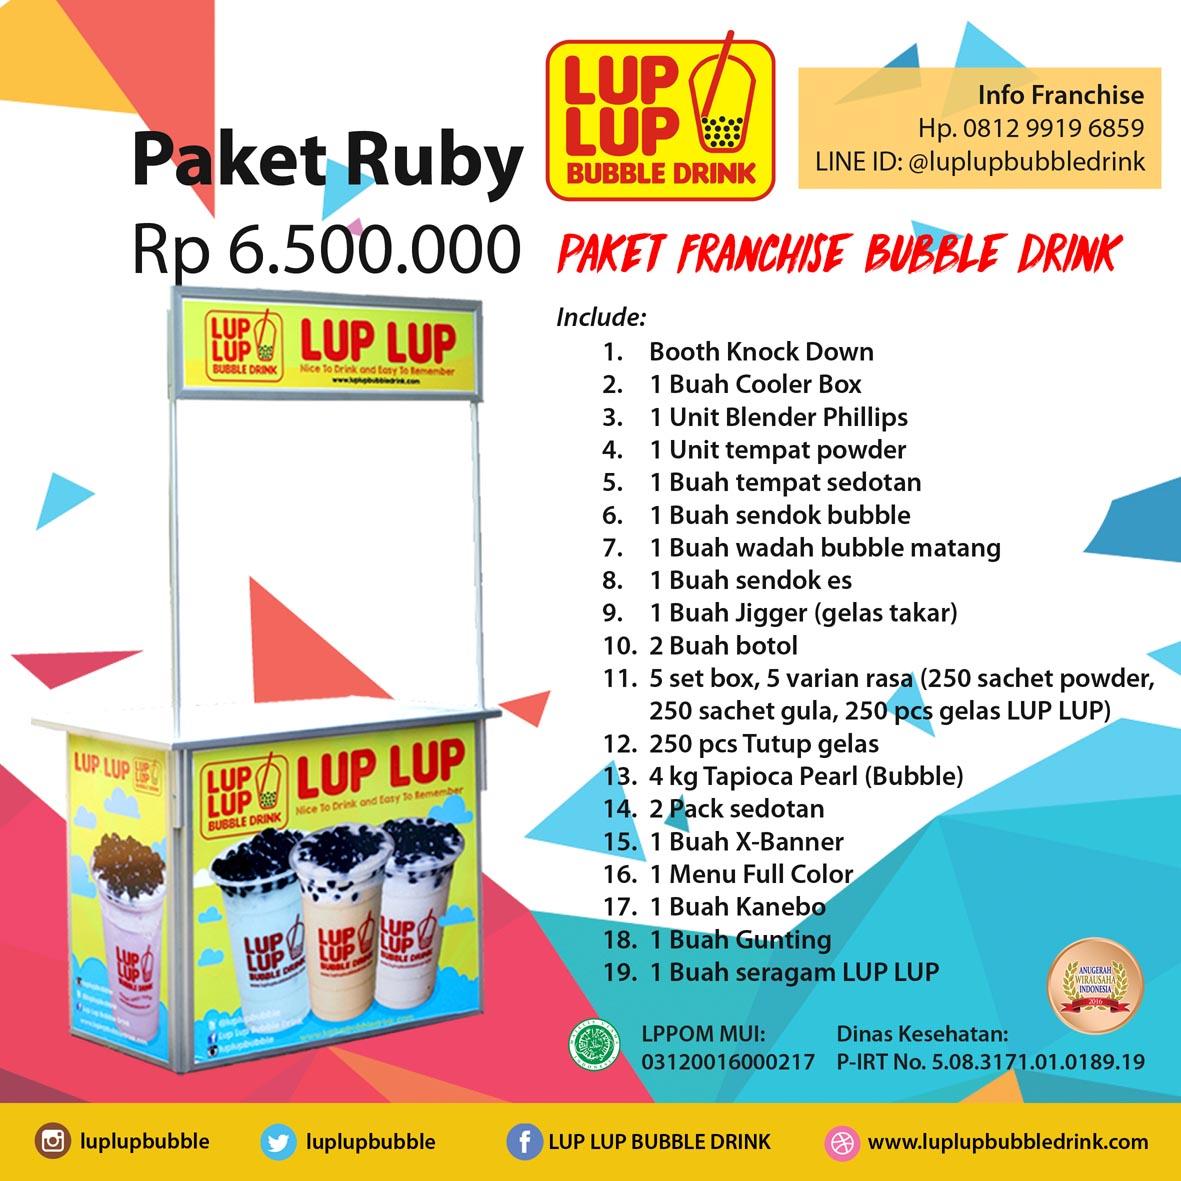 Jakarta Bubble Tea Supply: Peluang Usaha Dengan Modal ...